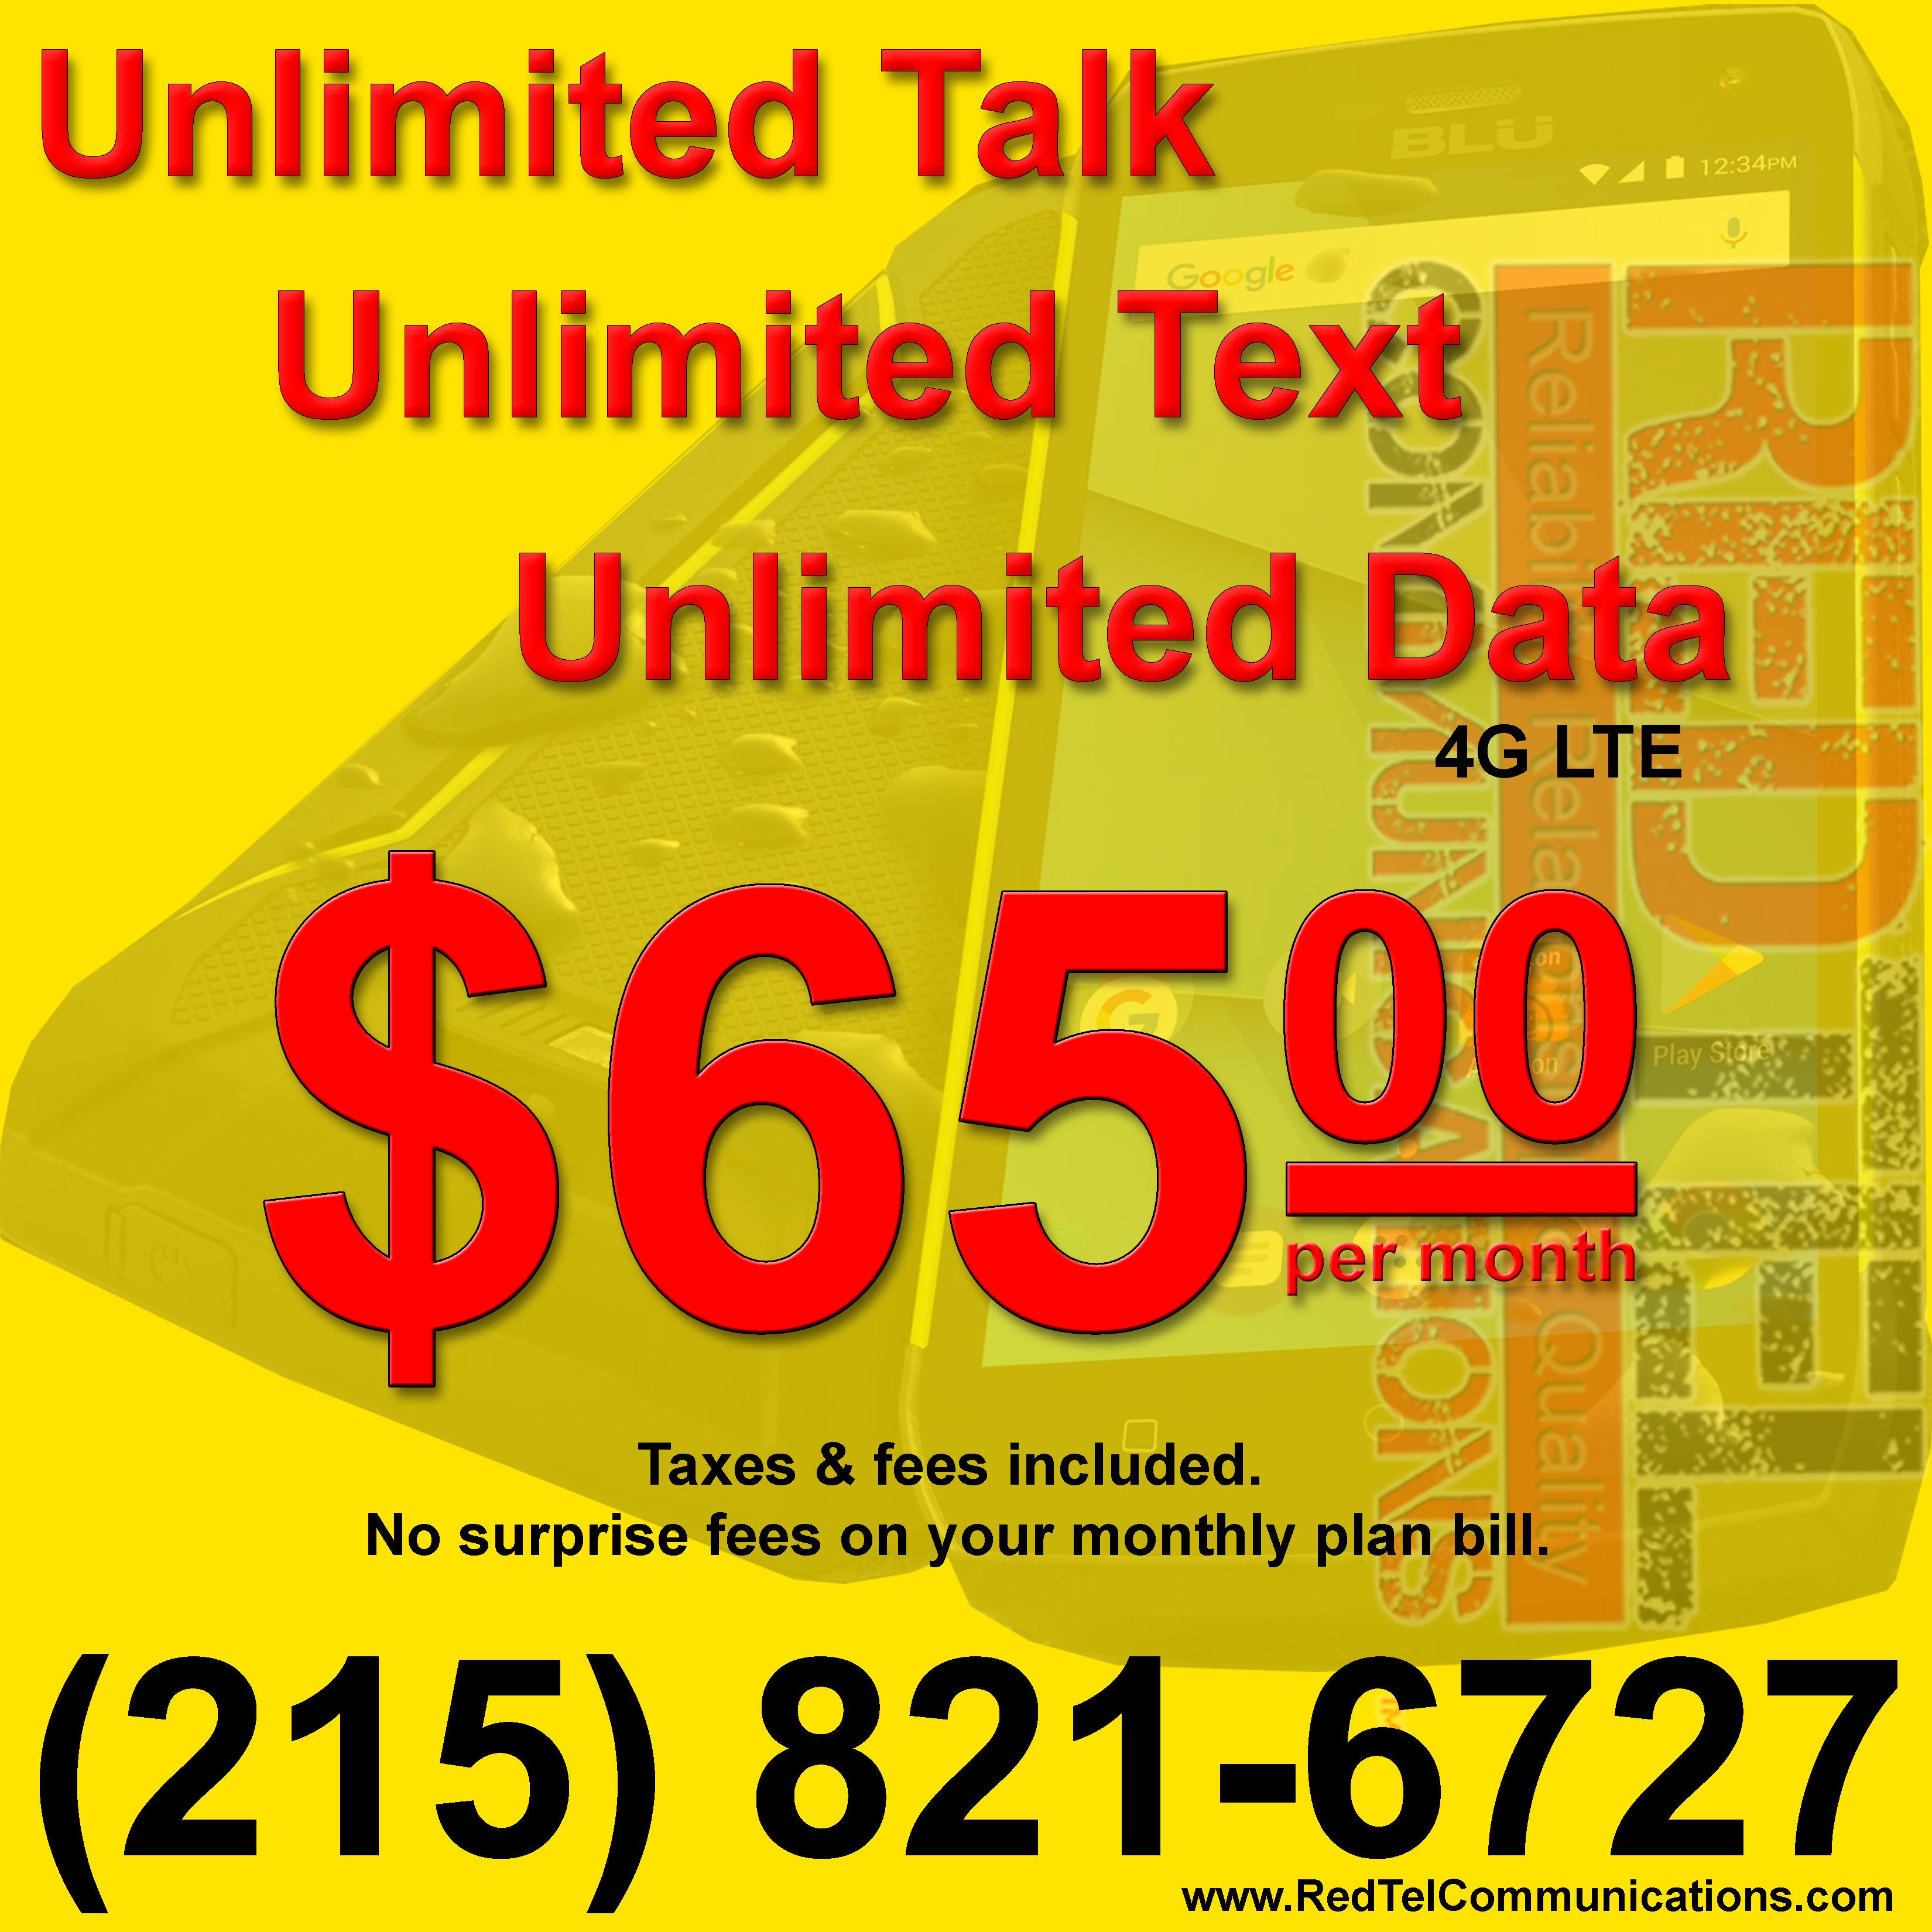 Redtel Unlimited Mobile Phone Plans – RedTel Communications